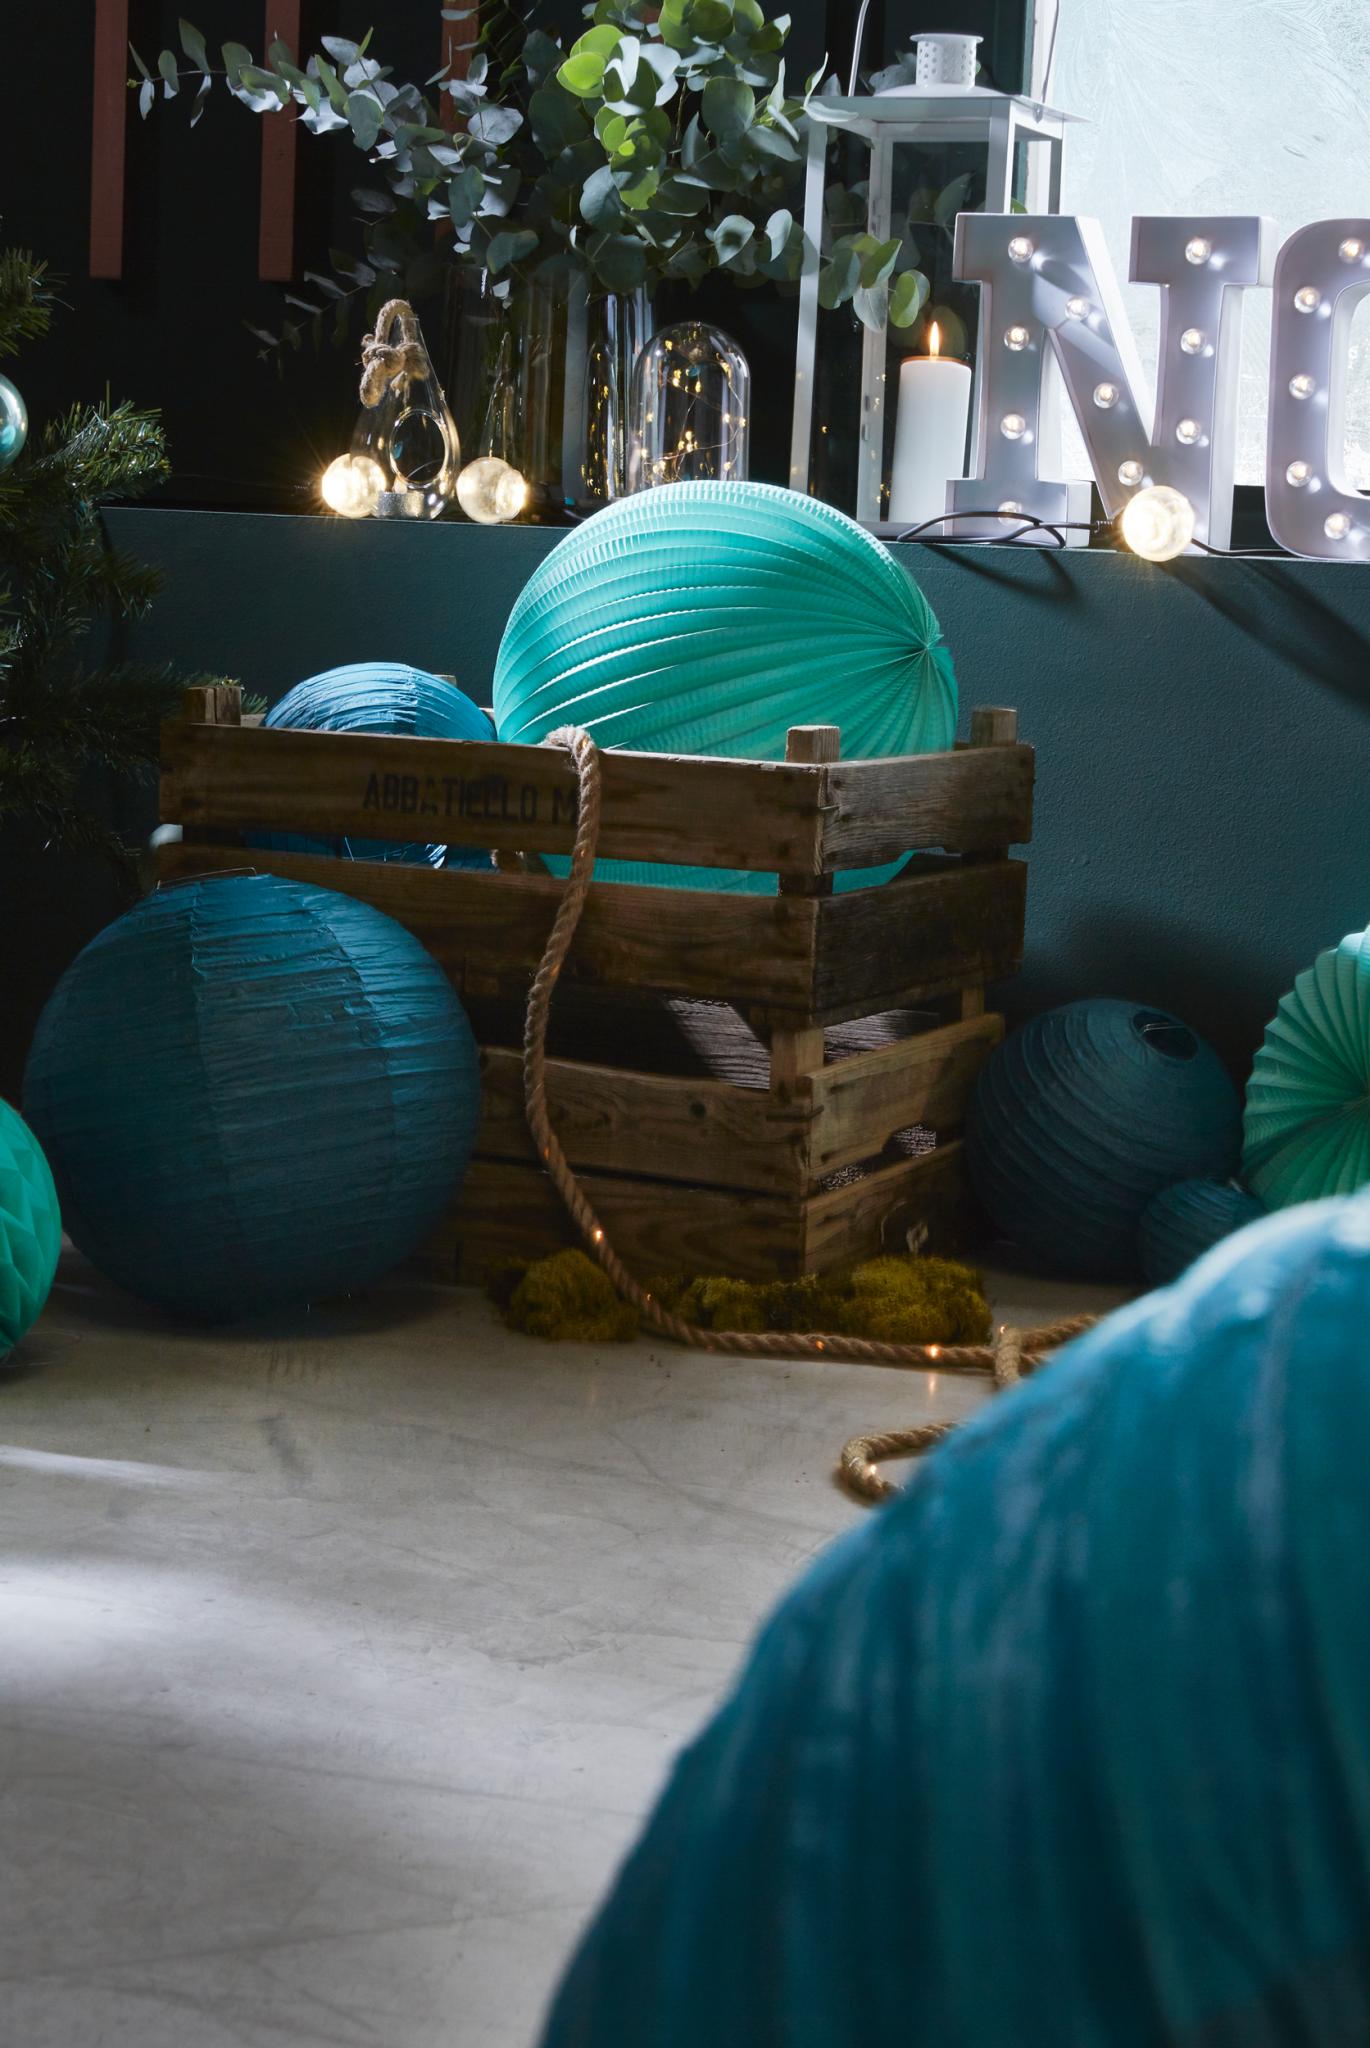 décoration de noel vert bleu bois tendance 2018 2017